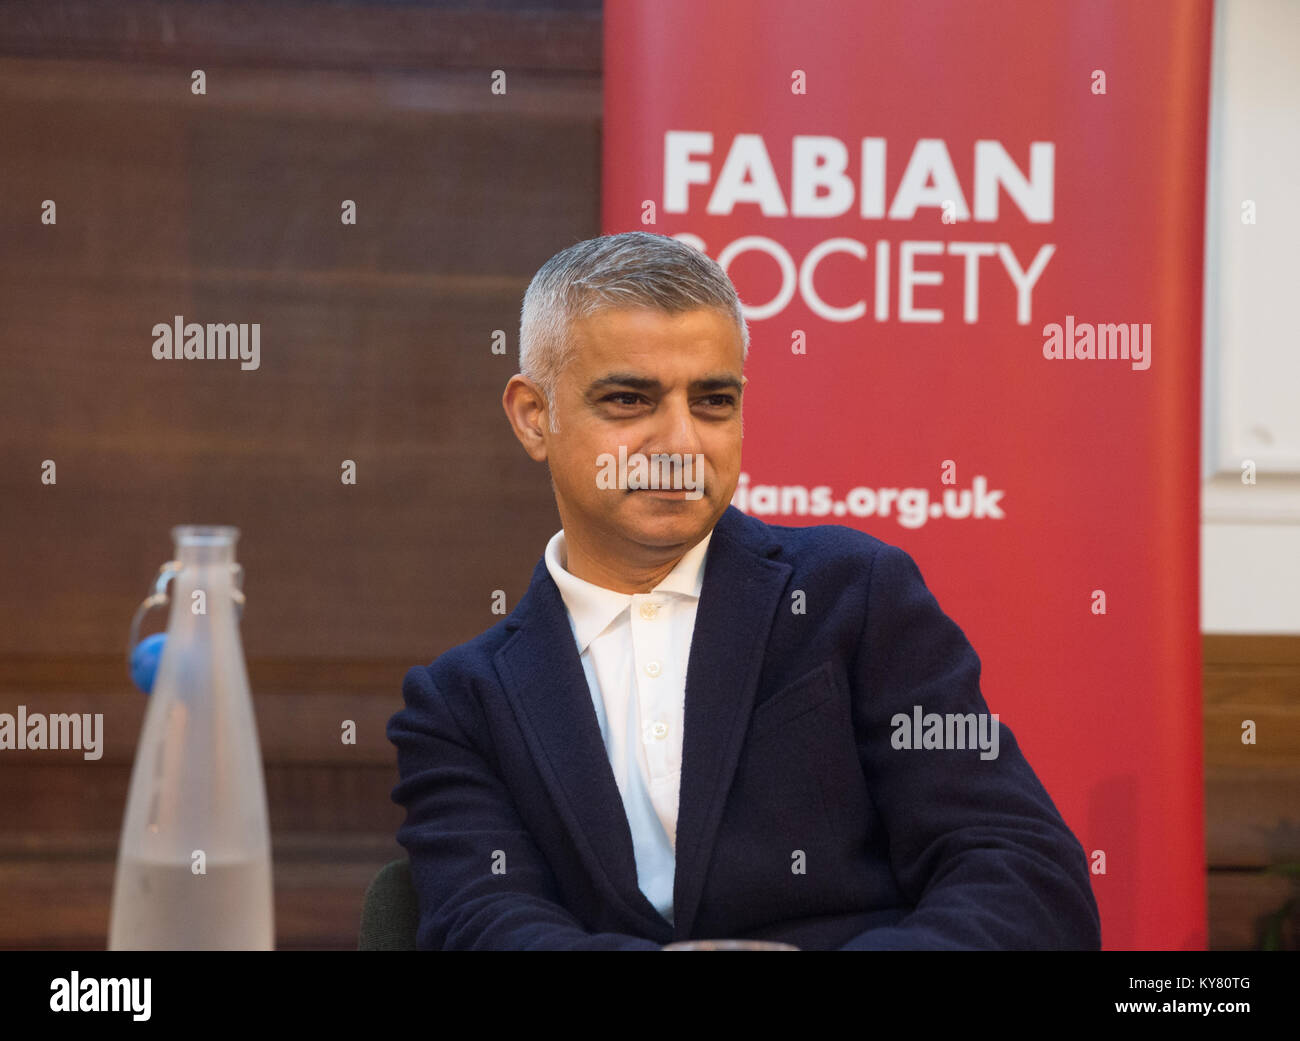 Mayor of London, Sadiq Khan, addresses the Fabian Society conference in Central London - Stock Image